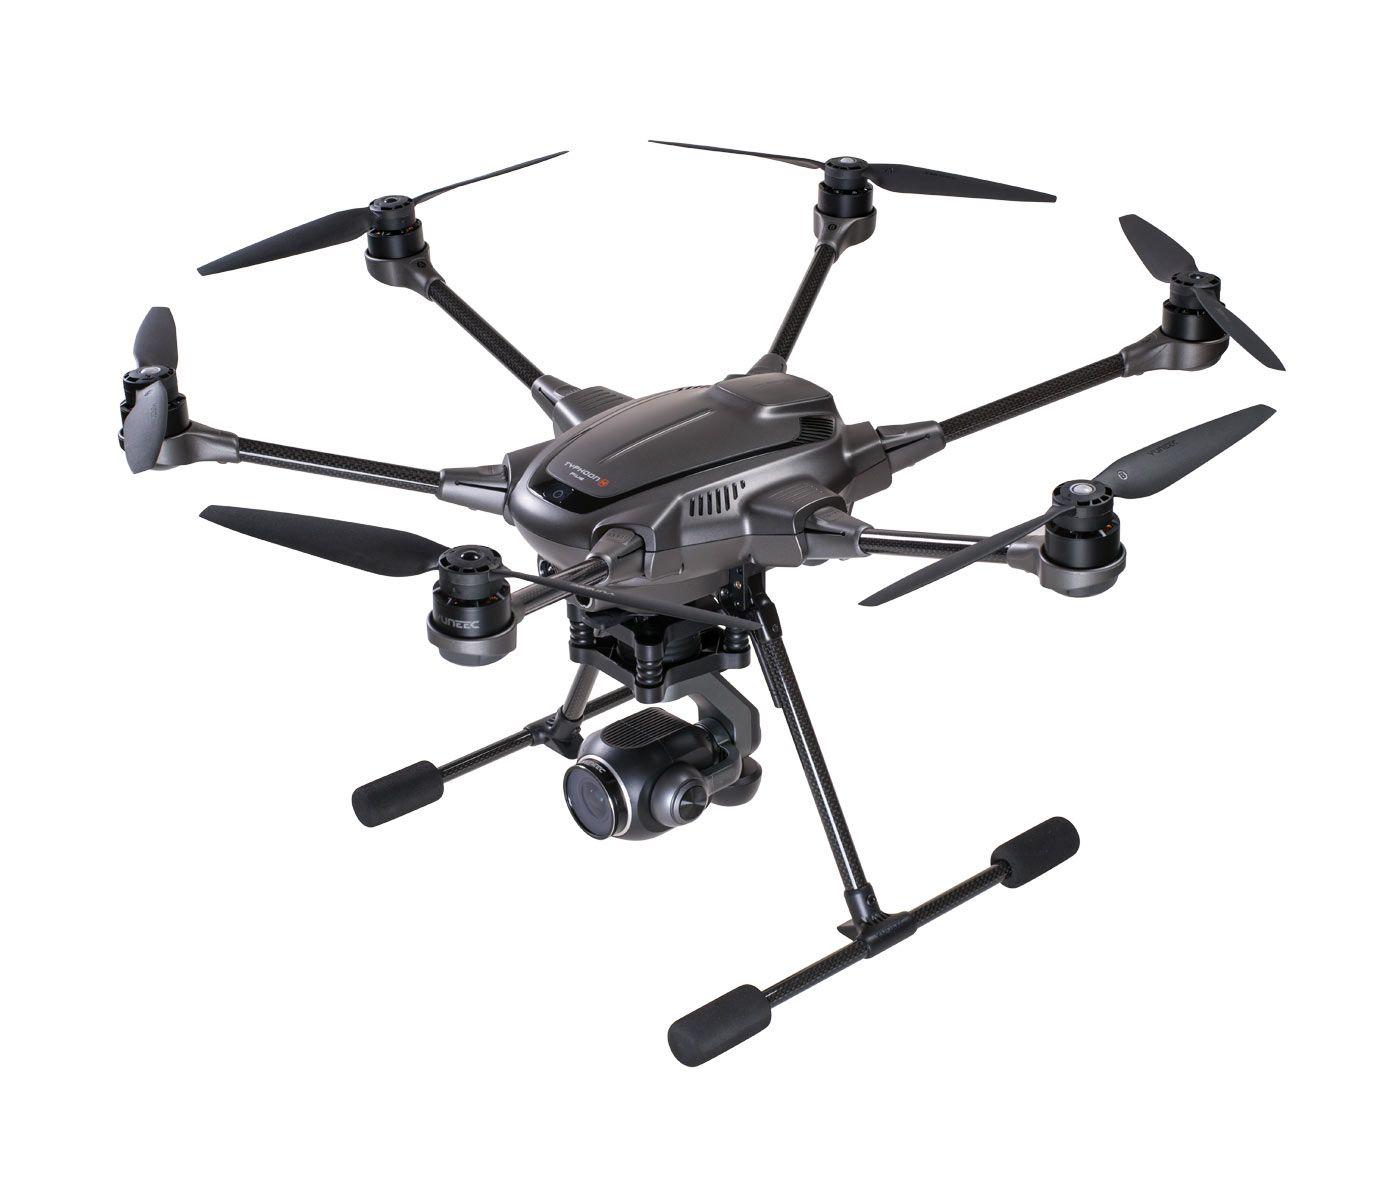 Yuneec Typhoon H Plus | Best Drones for photogrammetry